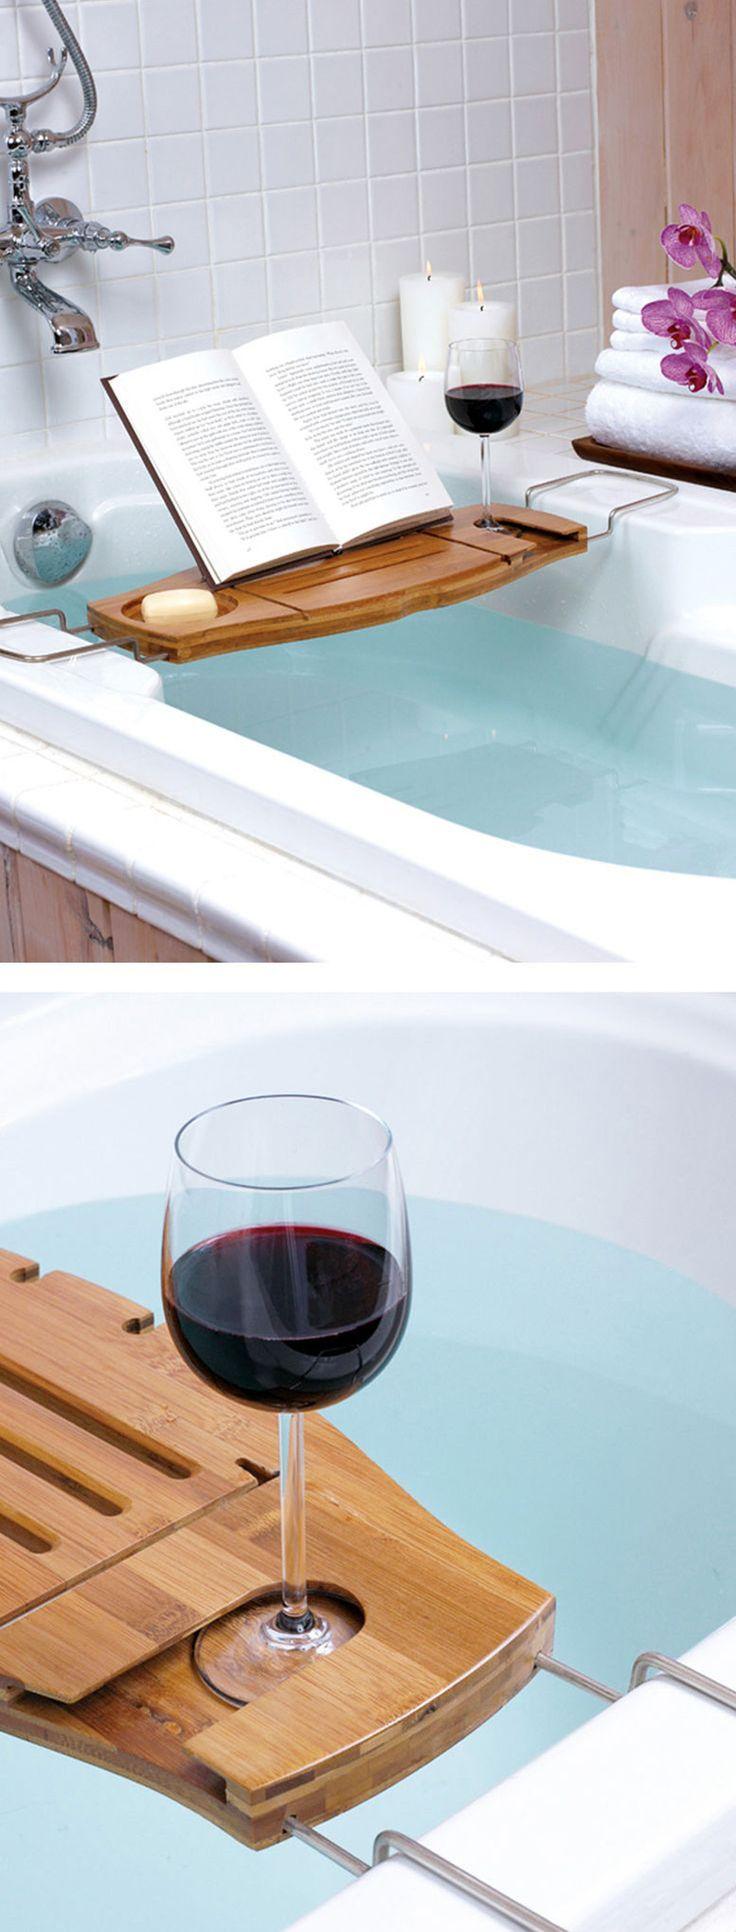 22 Cool Bathtub Caddies For Comfortable Bathing | http://www.designrulz.com/design/2015/07/22-cool-bathtub-caddies-for-comfortable-bathing/